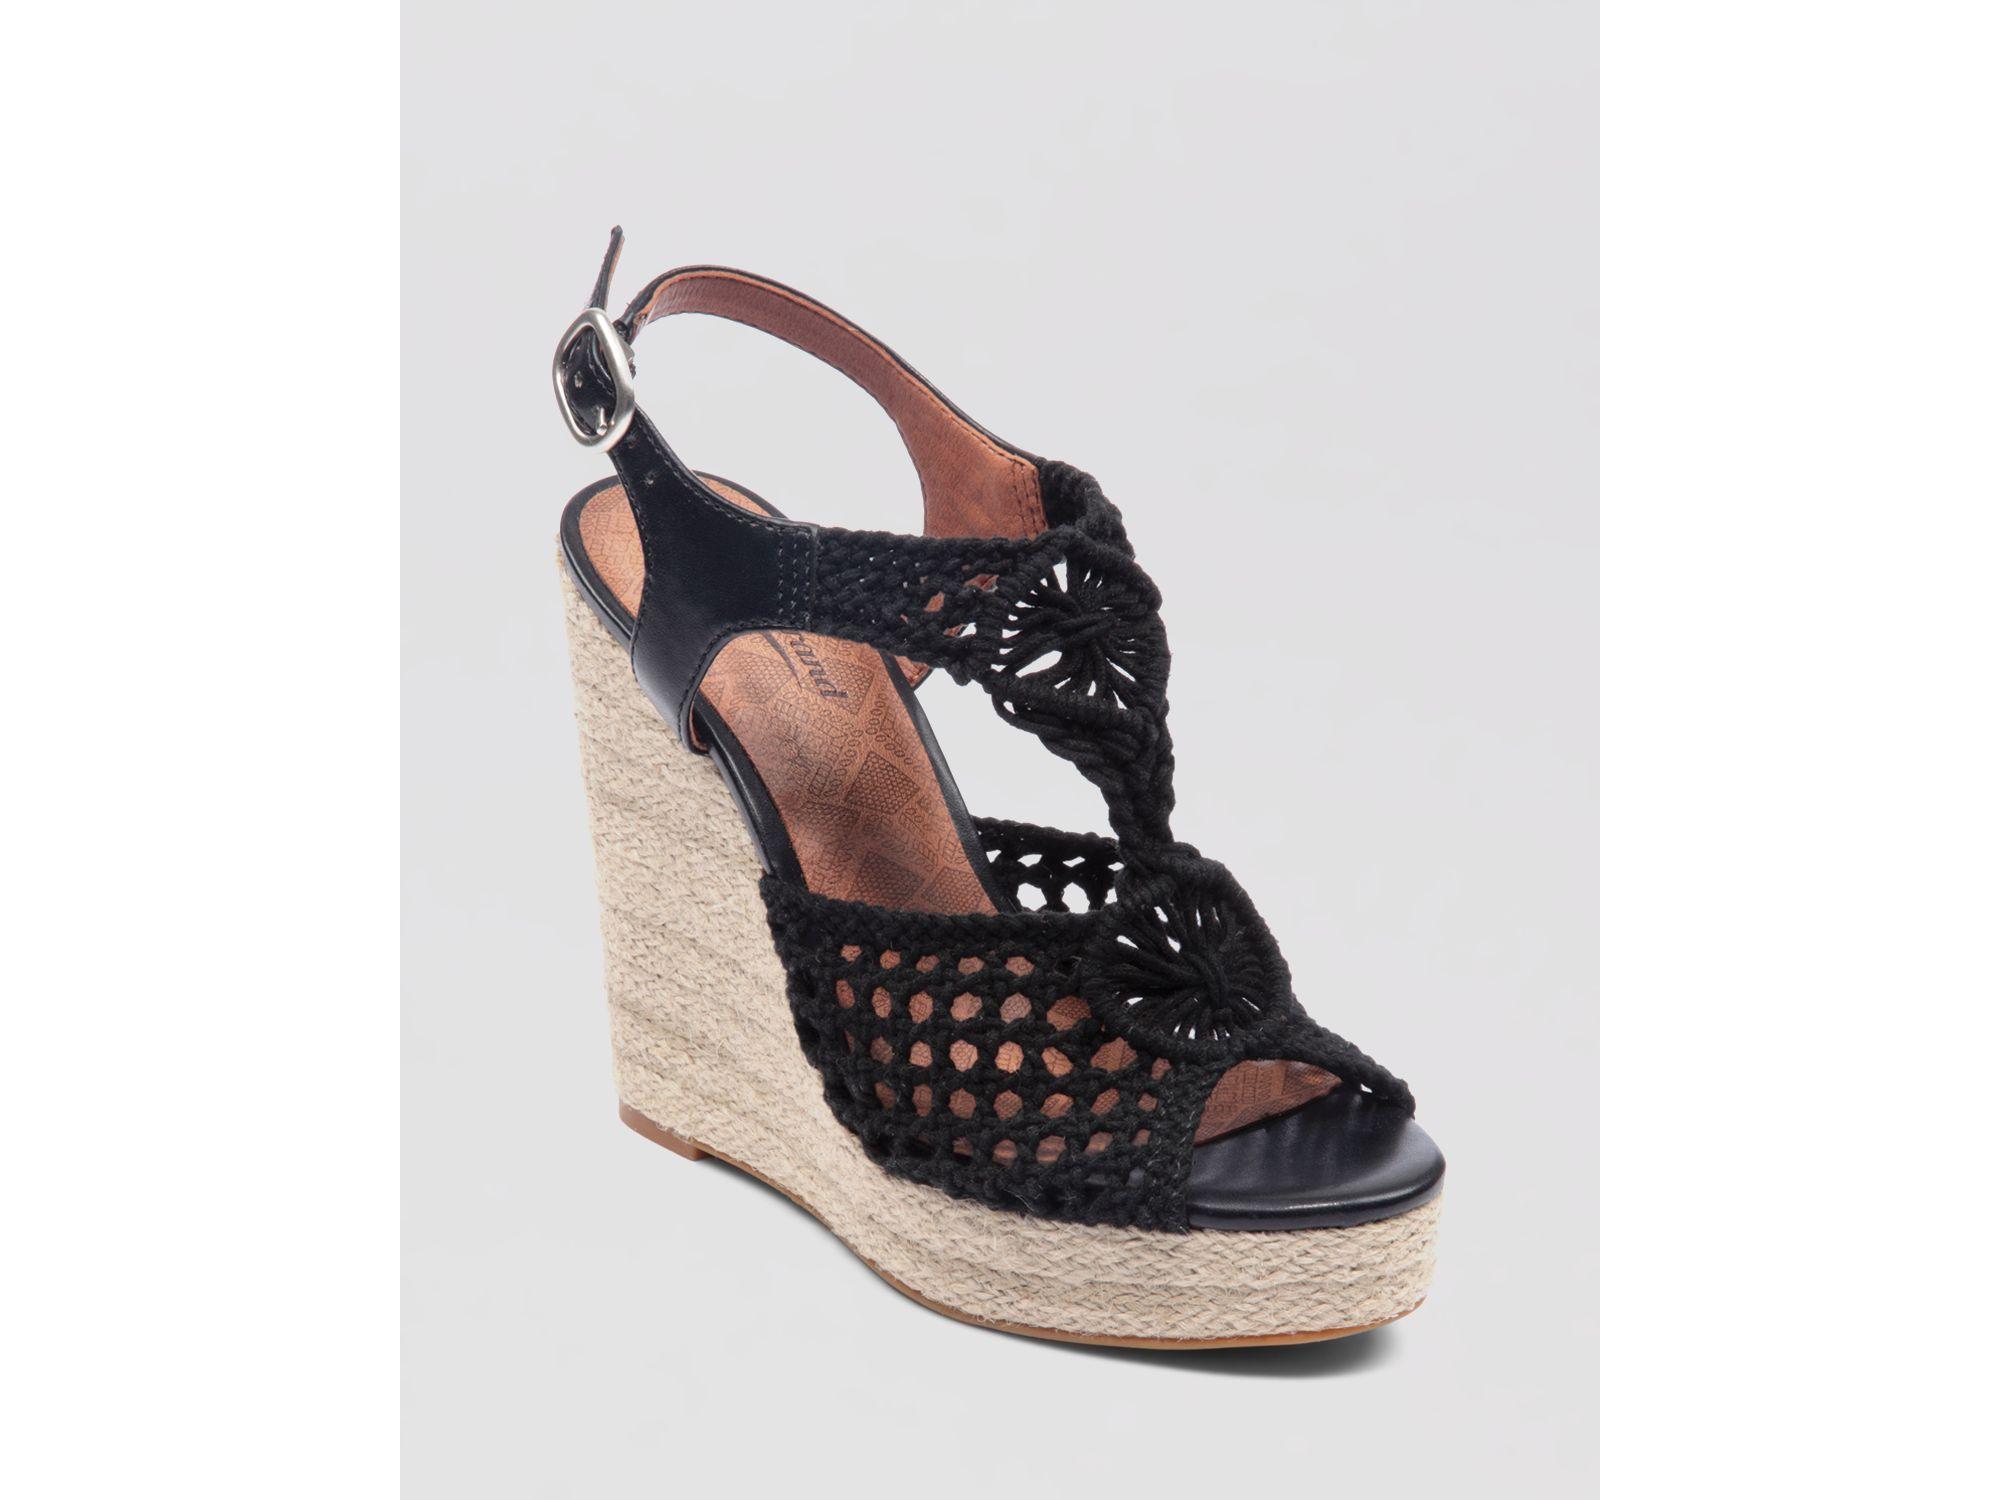 8ea08a932a5 Lyst - Lucky Brand Wedge Platform Sandals Rilo Crochet in Black